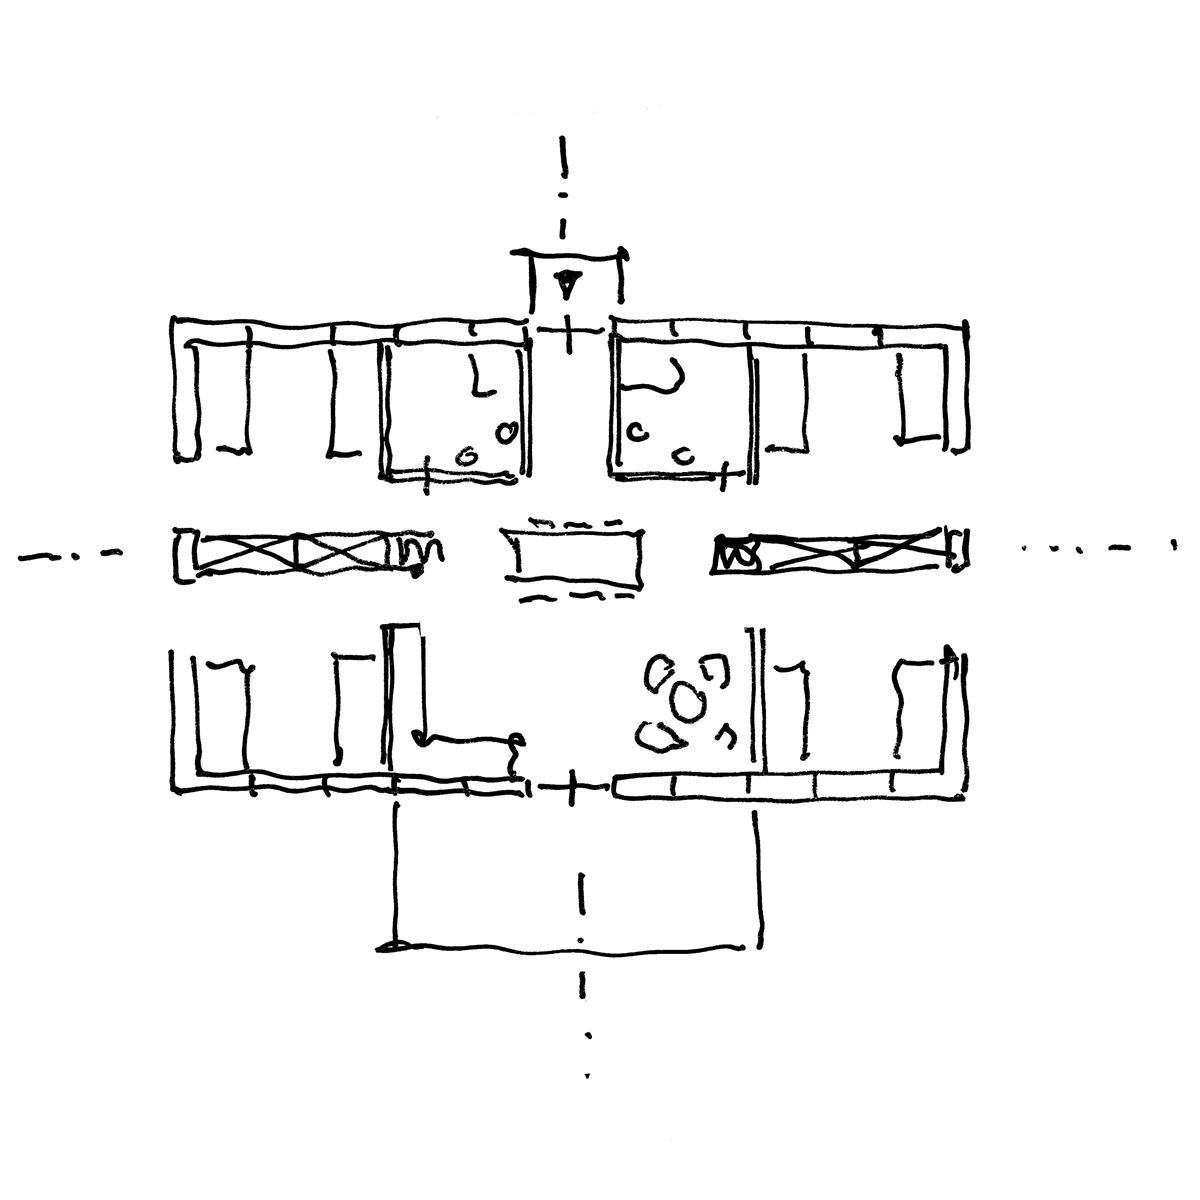 missfeldt-krass-dlrg-grömitz-herberge-1-neu